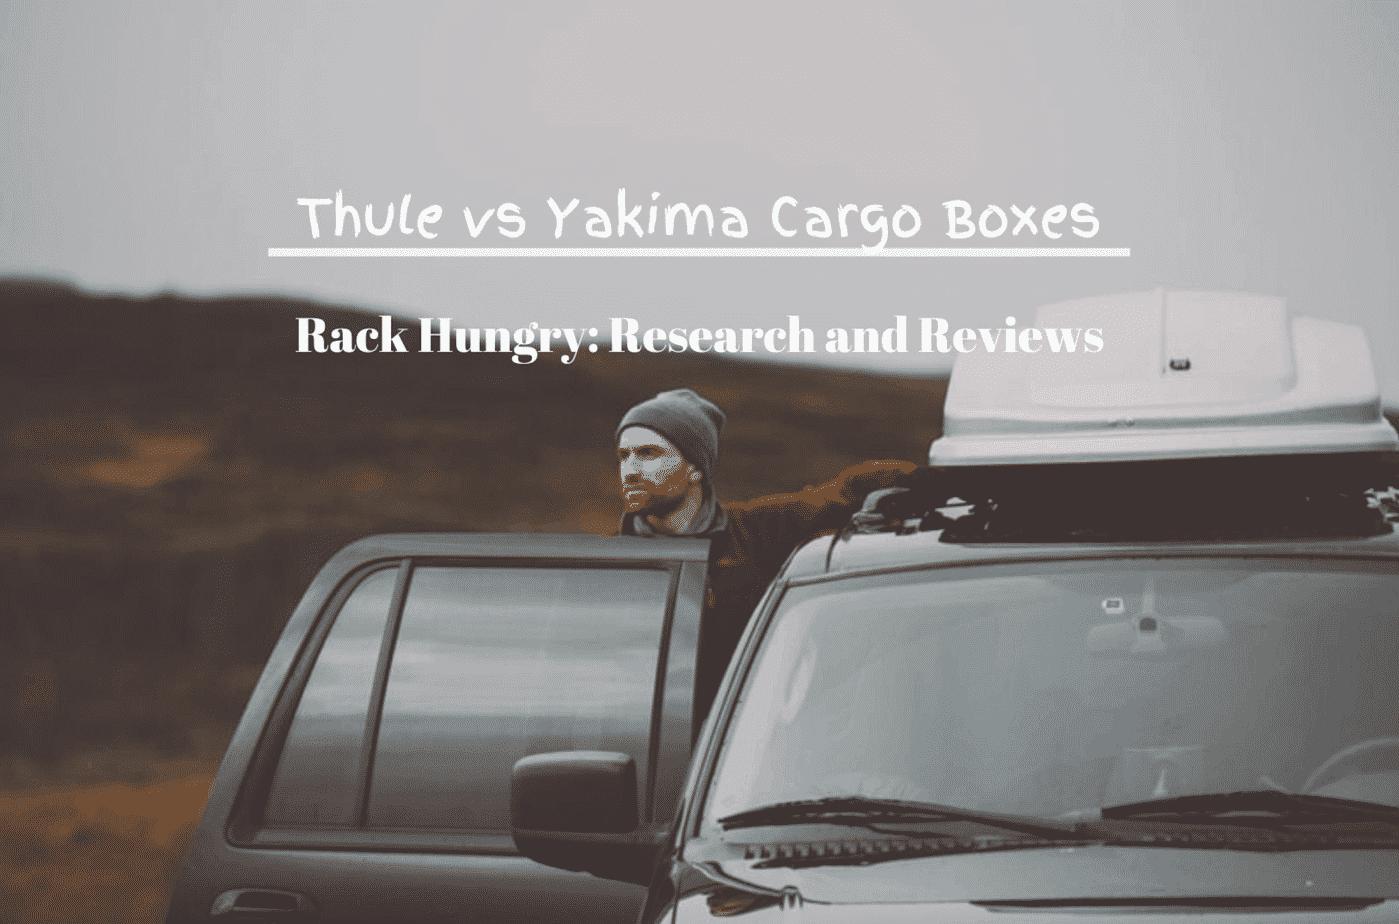 Thule vs Yakim Cargo Boxes